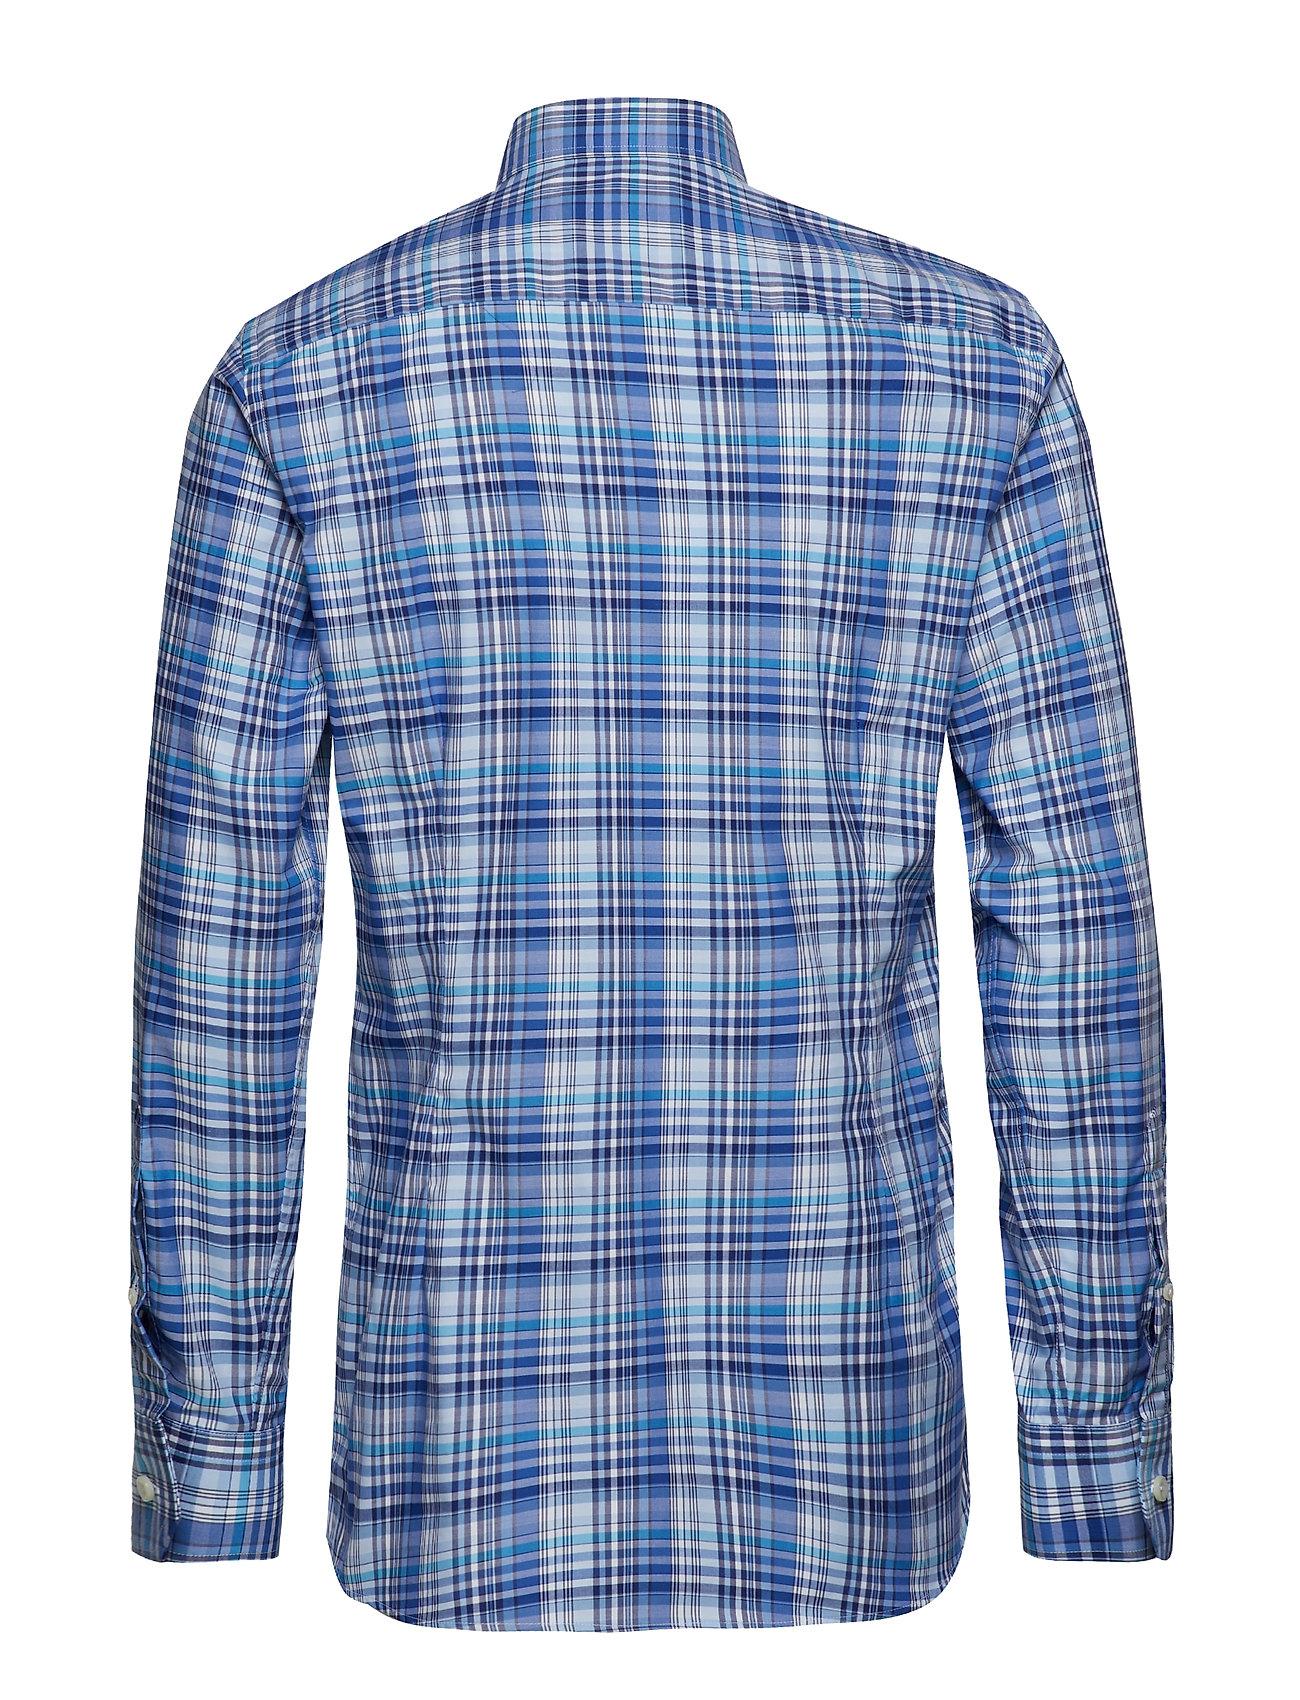 Blue Blue ShirtblueEton Check ShirtblueEton ShirtblueEton Bold Check Bold Bold Blue Blue Check Bold 35R4AjLq